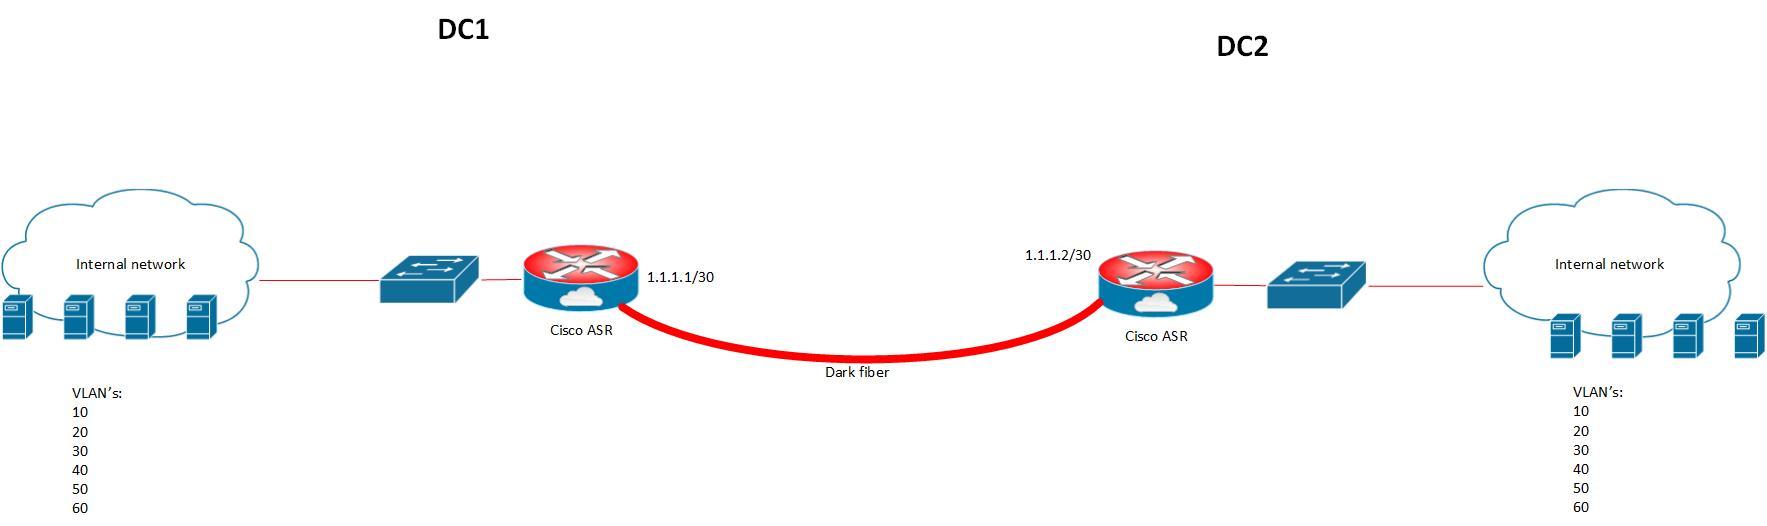 Configuring OTV on a Cisco ASR - InfraWorld - Network Packet Blog